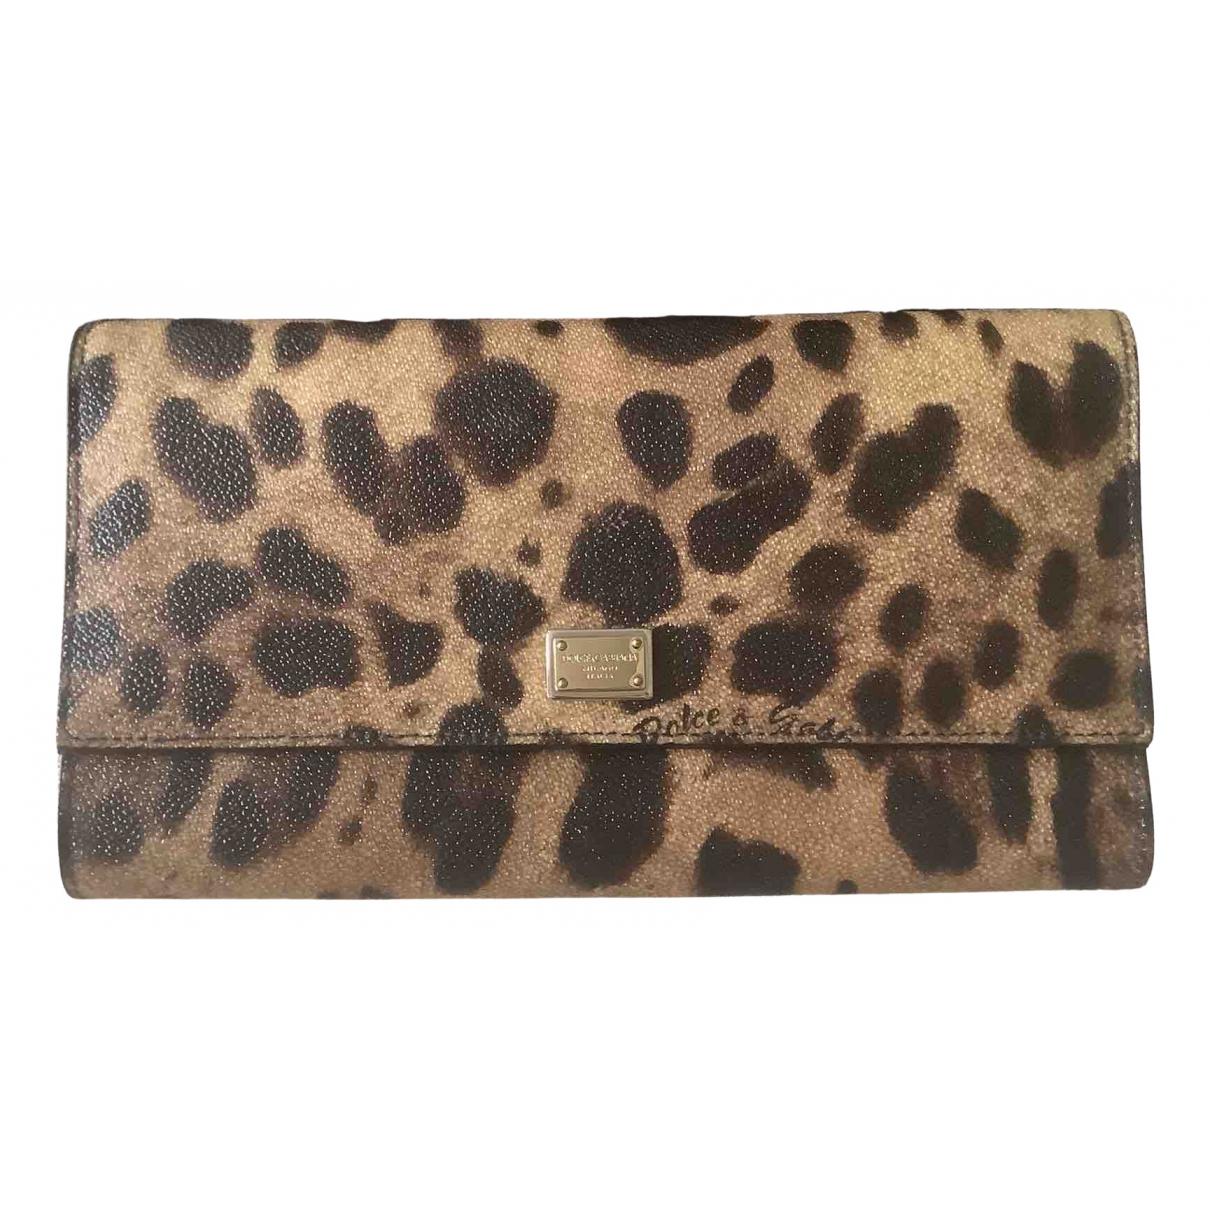 Dolce & Gabbana N Brown Cloth handbag for Women N